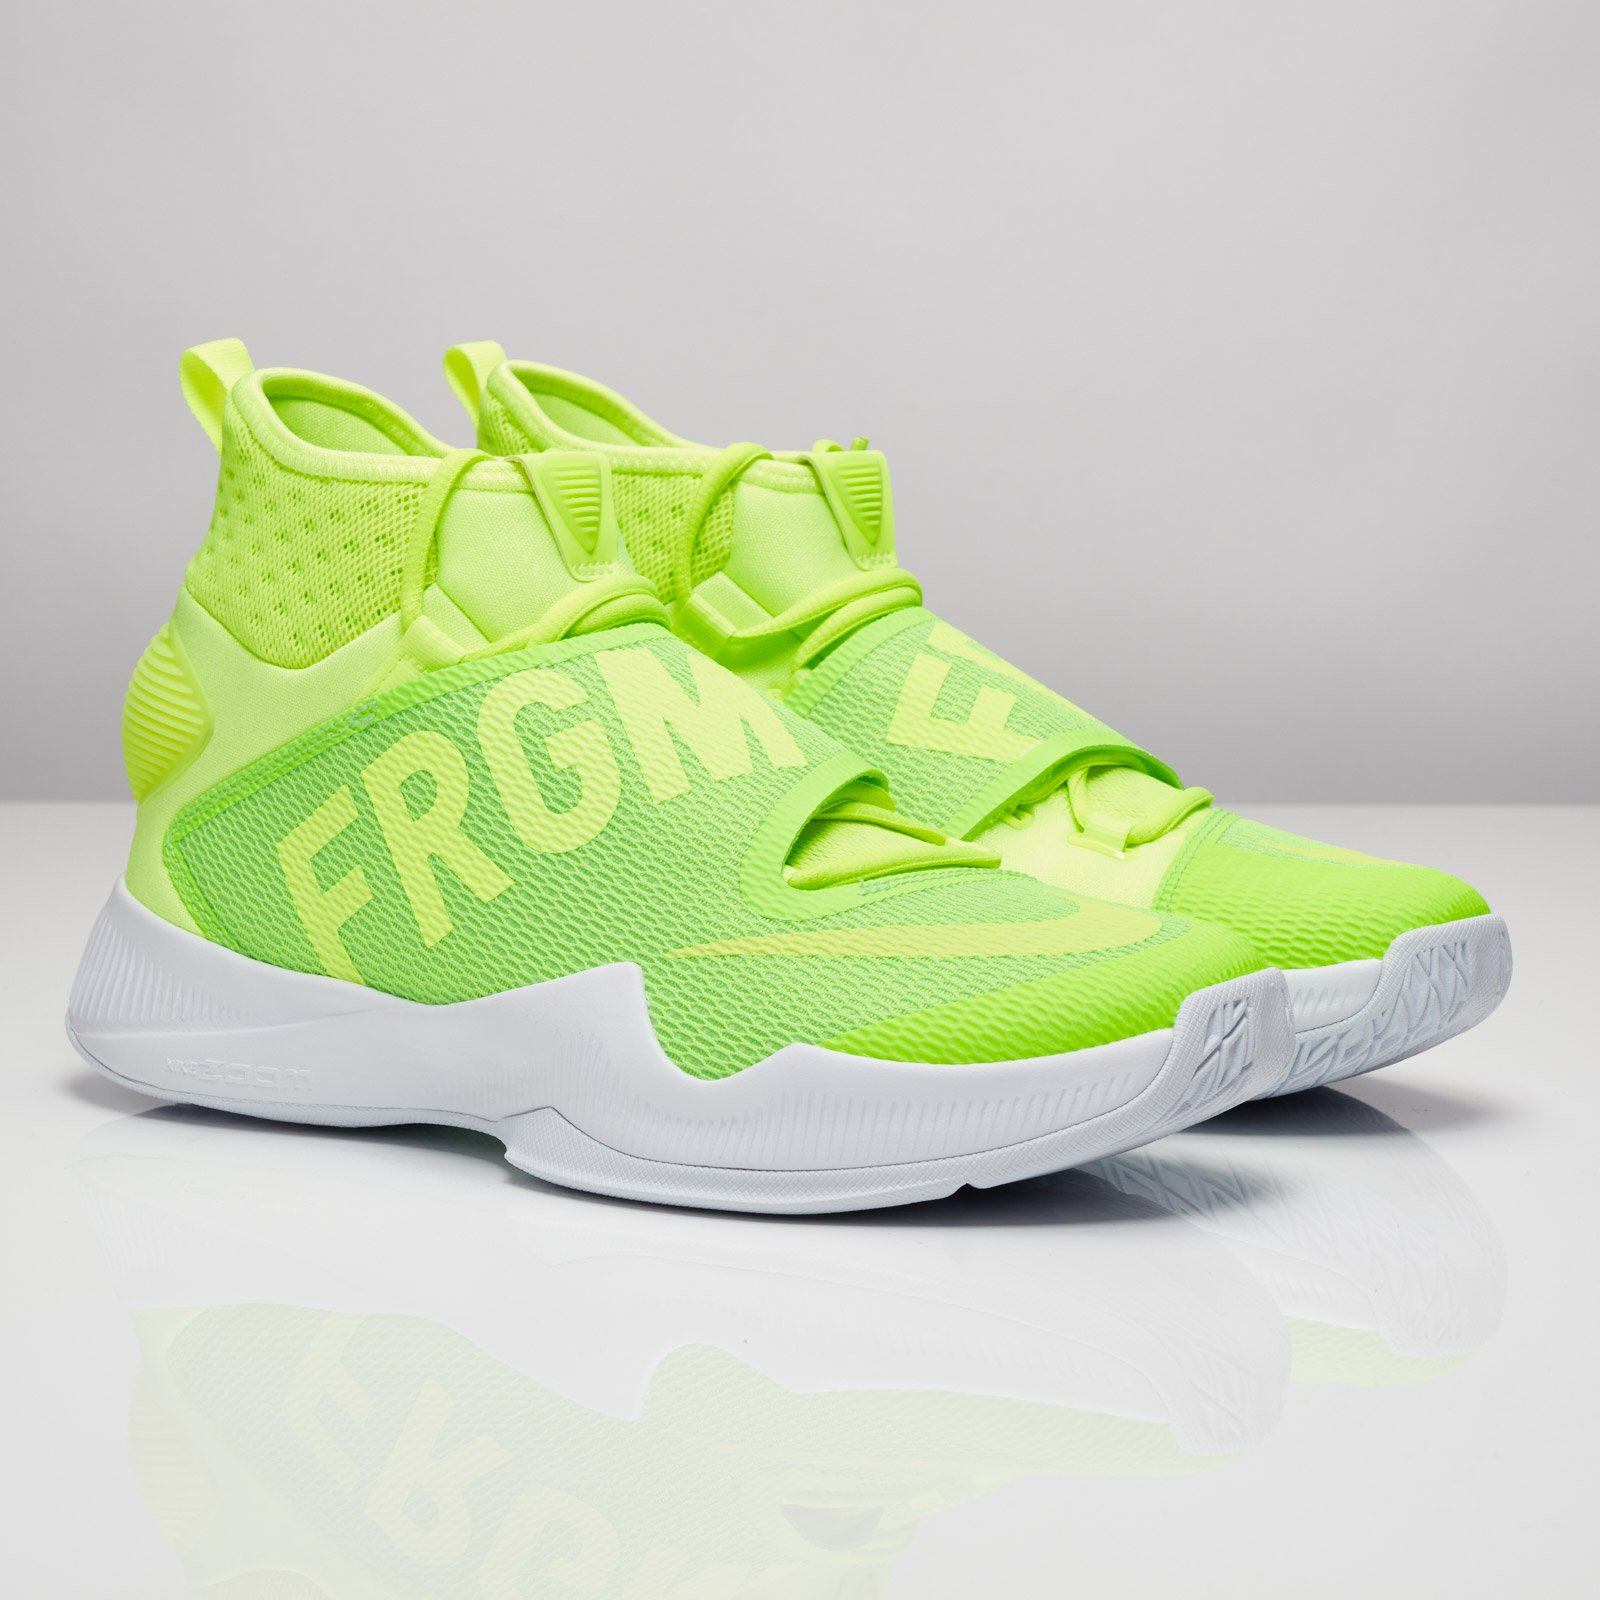 b57cc9bcebbd Nike Zoom Hyperrev 2016 Fragment - 848556-371 - Sneakersnstuff ...